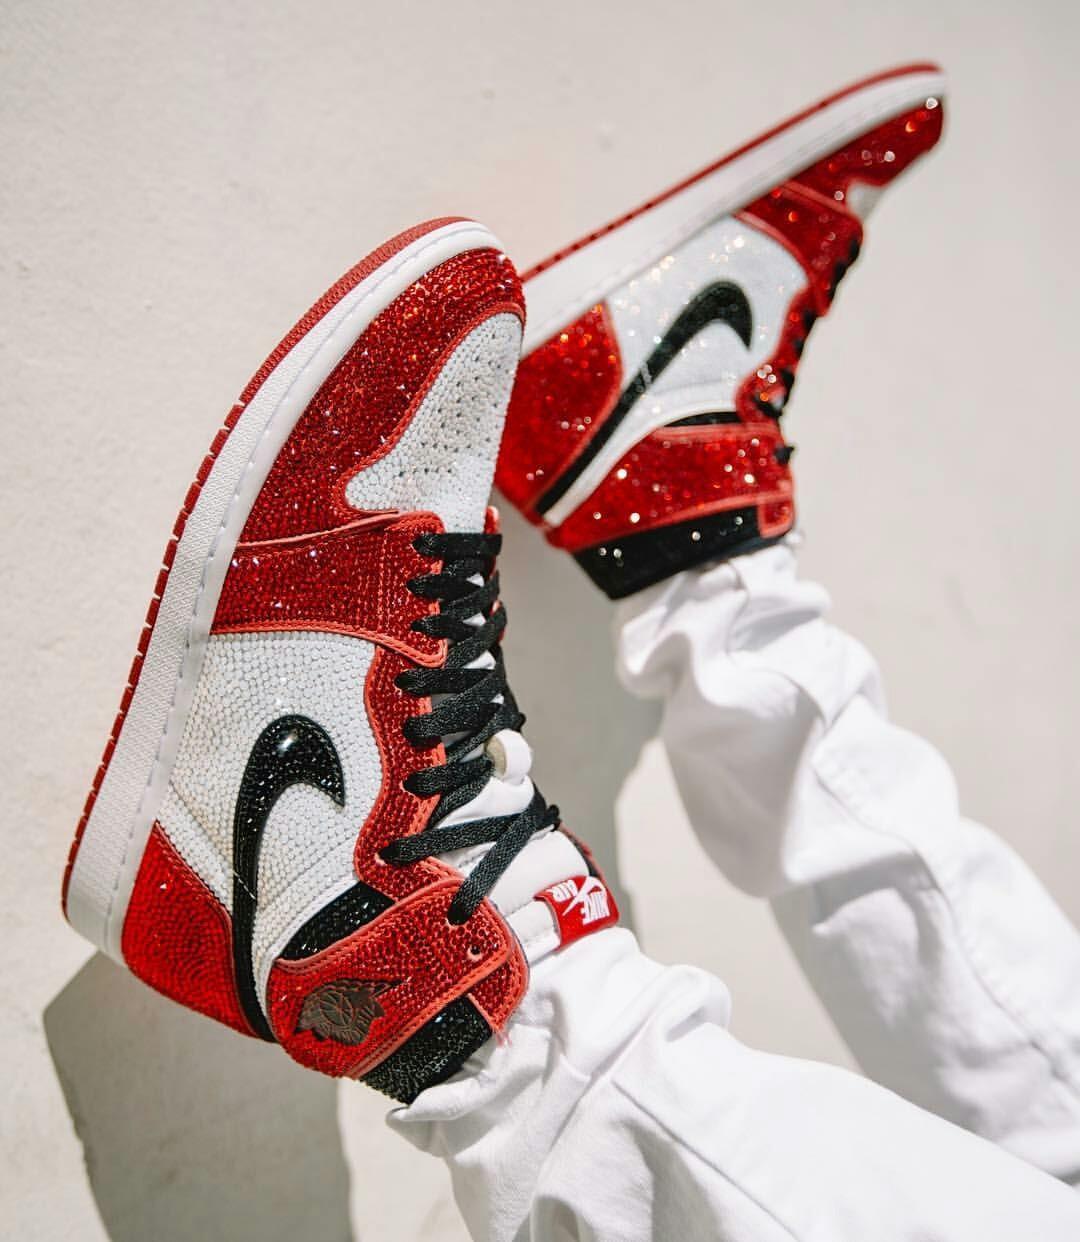 mármol jurar capitán  Nike Air Jordan Tumblr Wallpapers - Wallpaper Cave